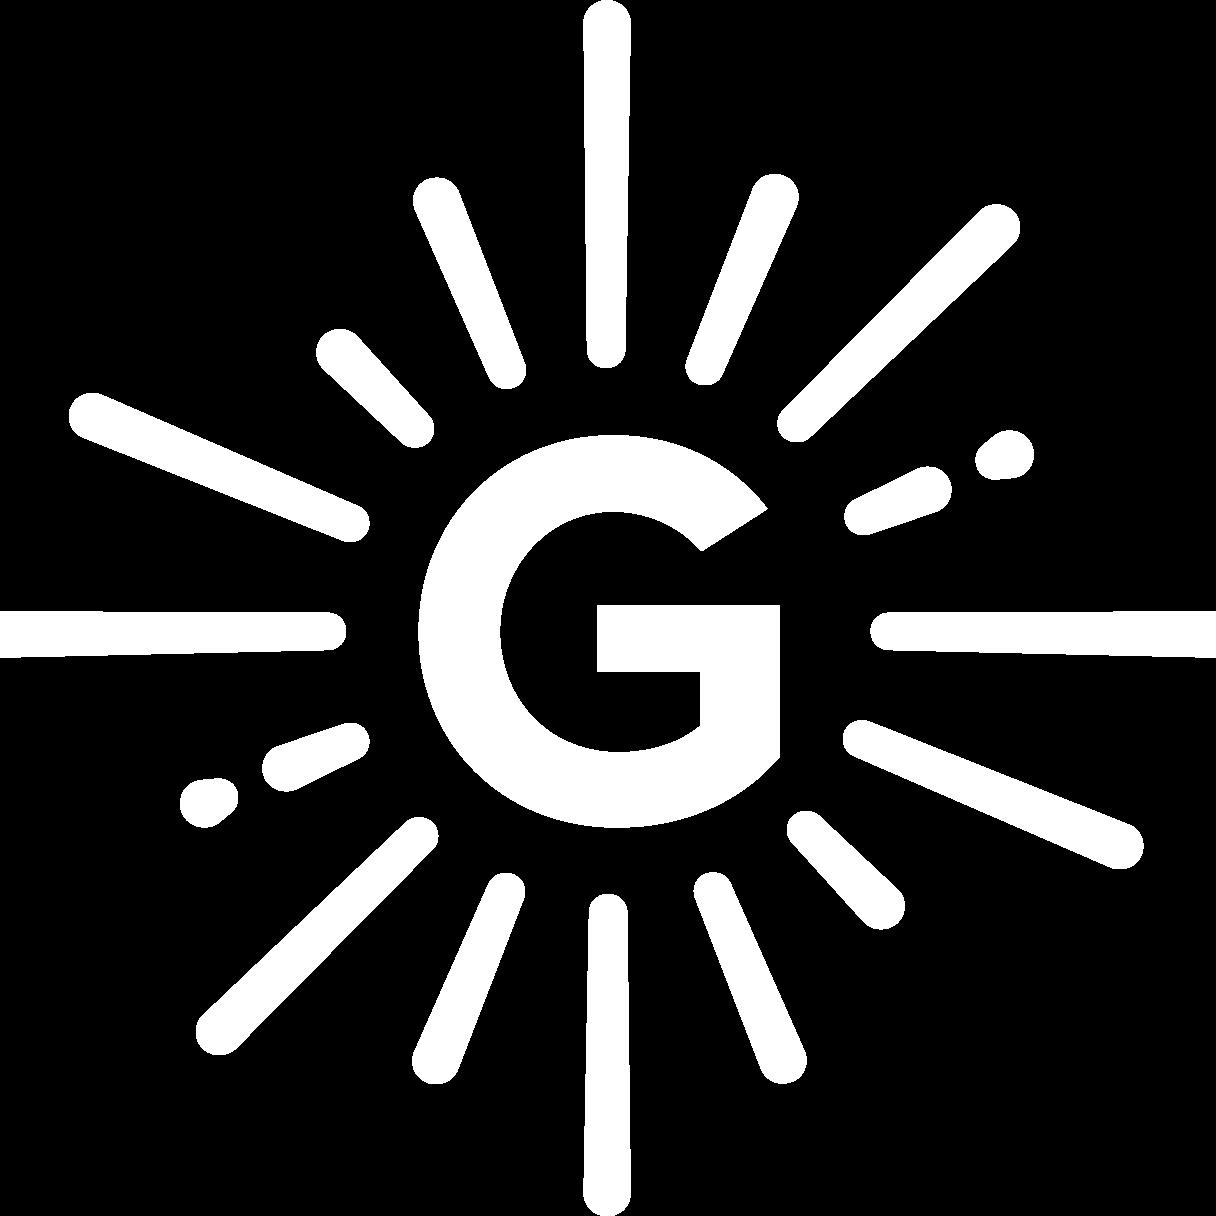 @girlsempowermentnetwork Profile Image | Linktree